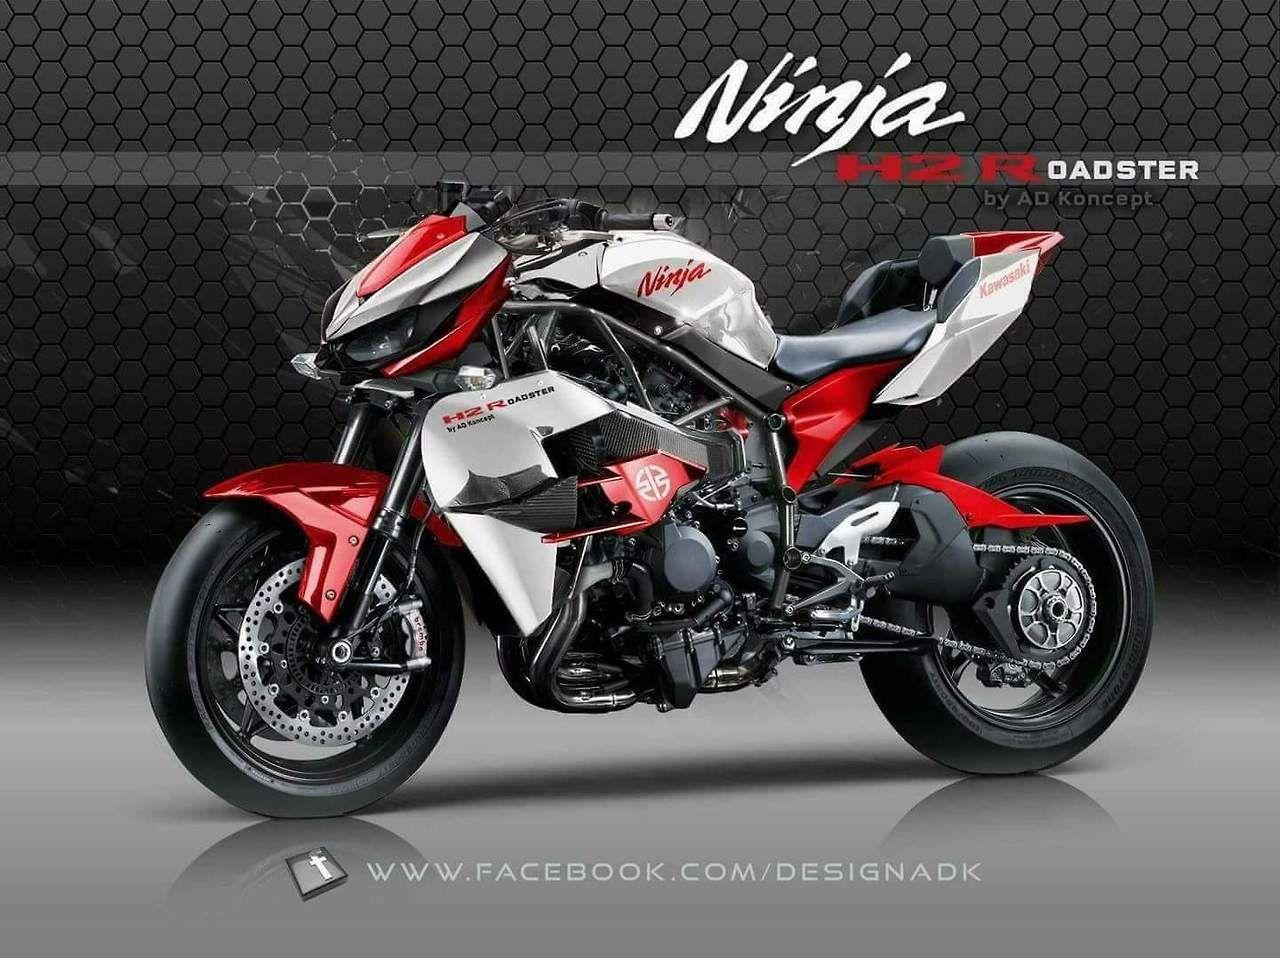 Kawasaki Ninja H2 Roadster Kawasaki Kawasaki Ninja Motorcycle